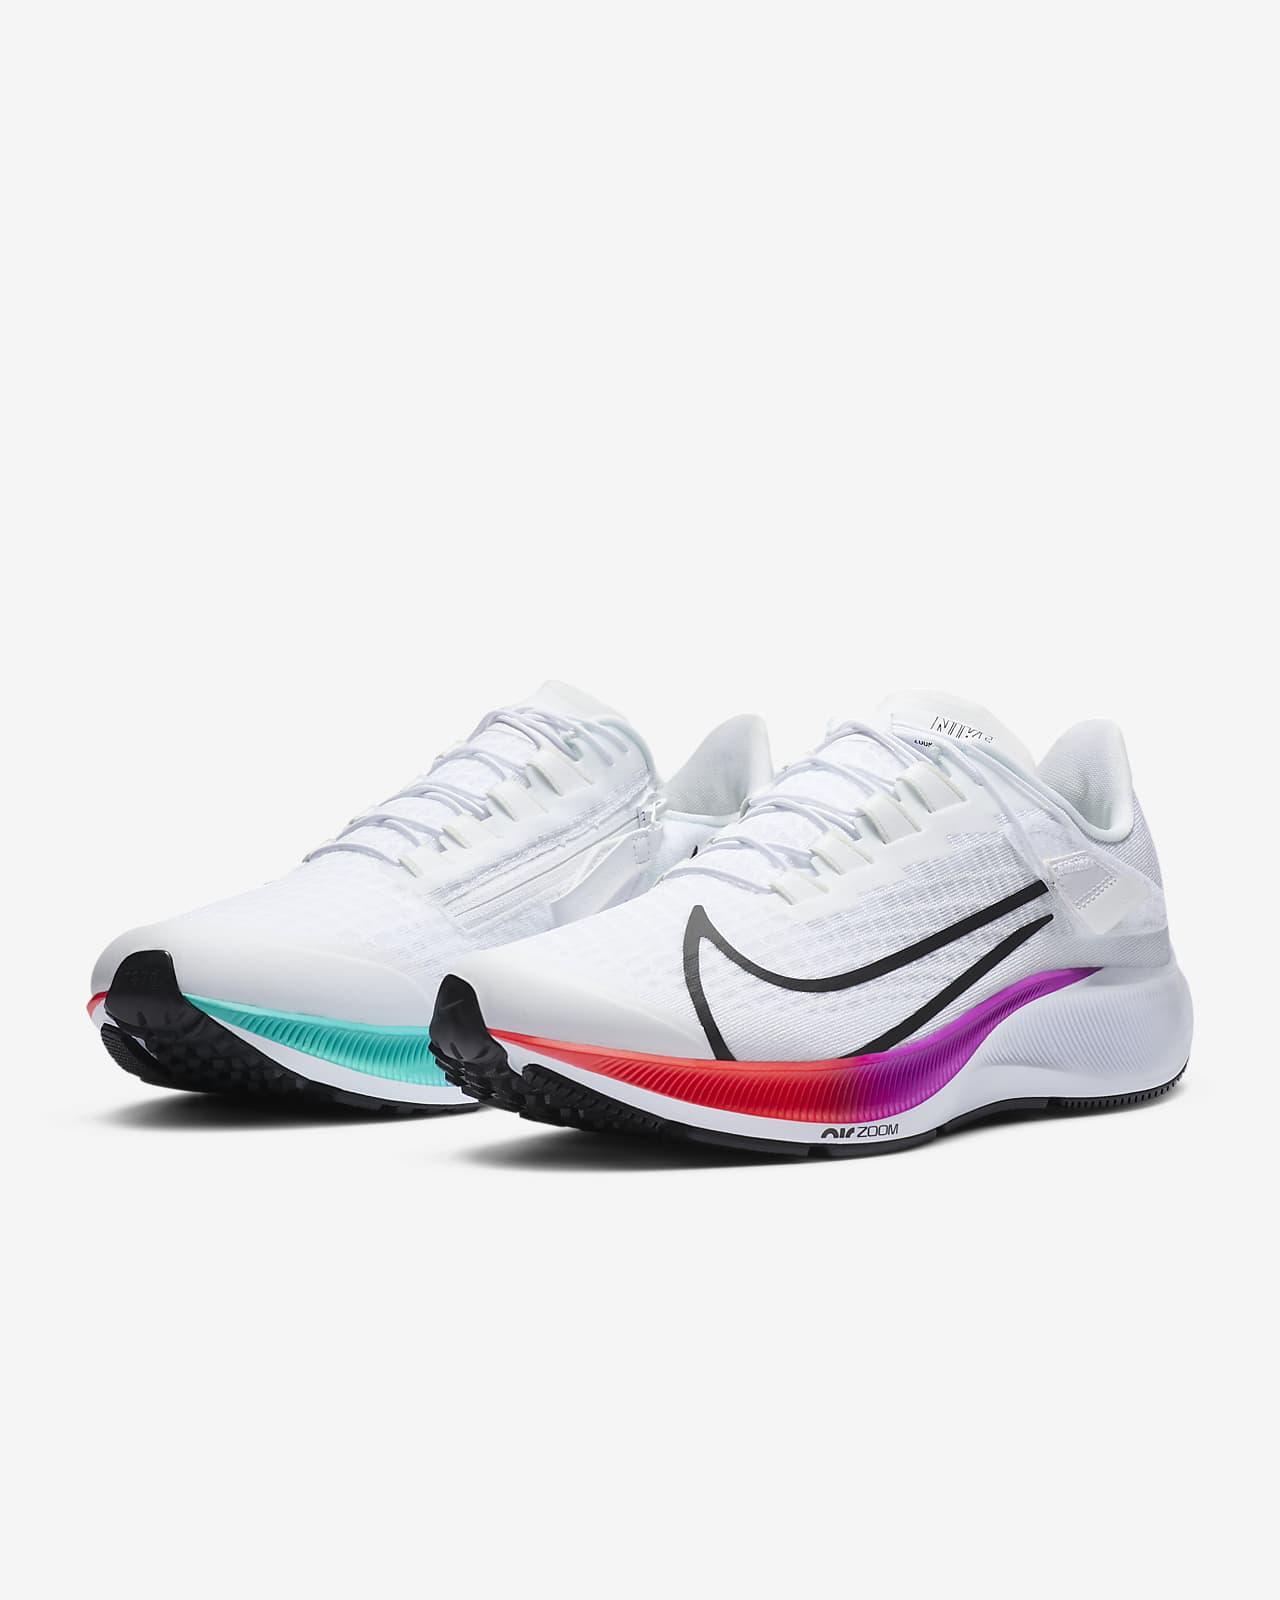 Löparsko Nike Air Zoom Pegasus 37 FlyEase för män